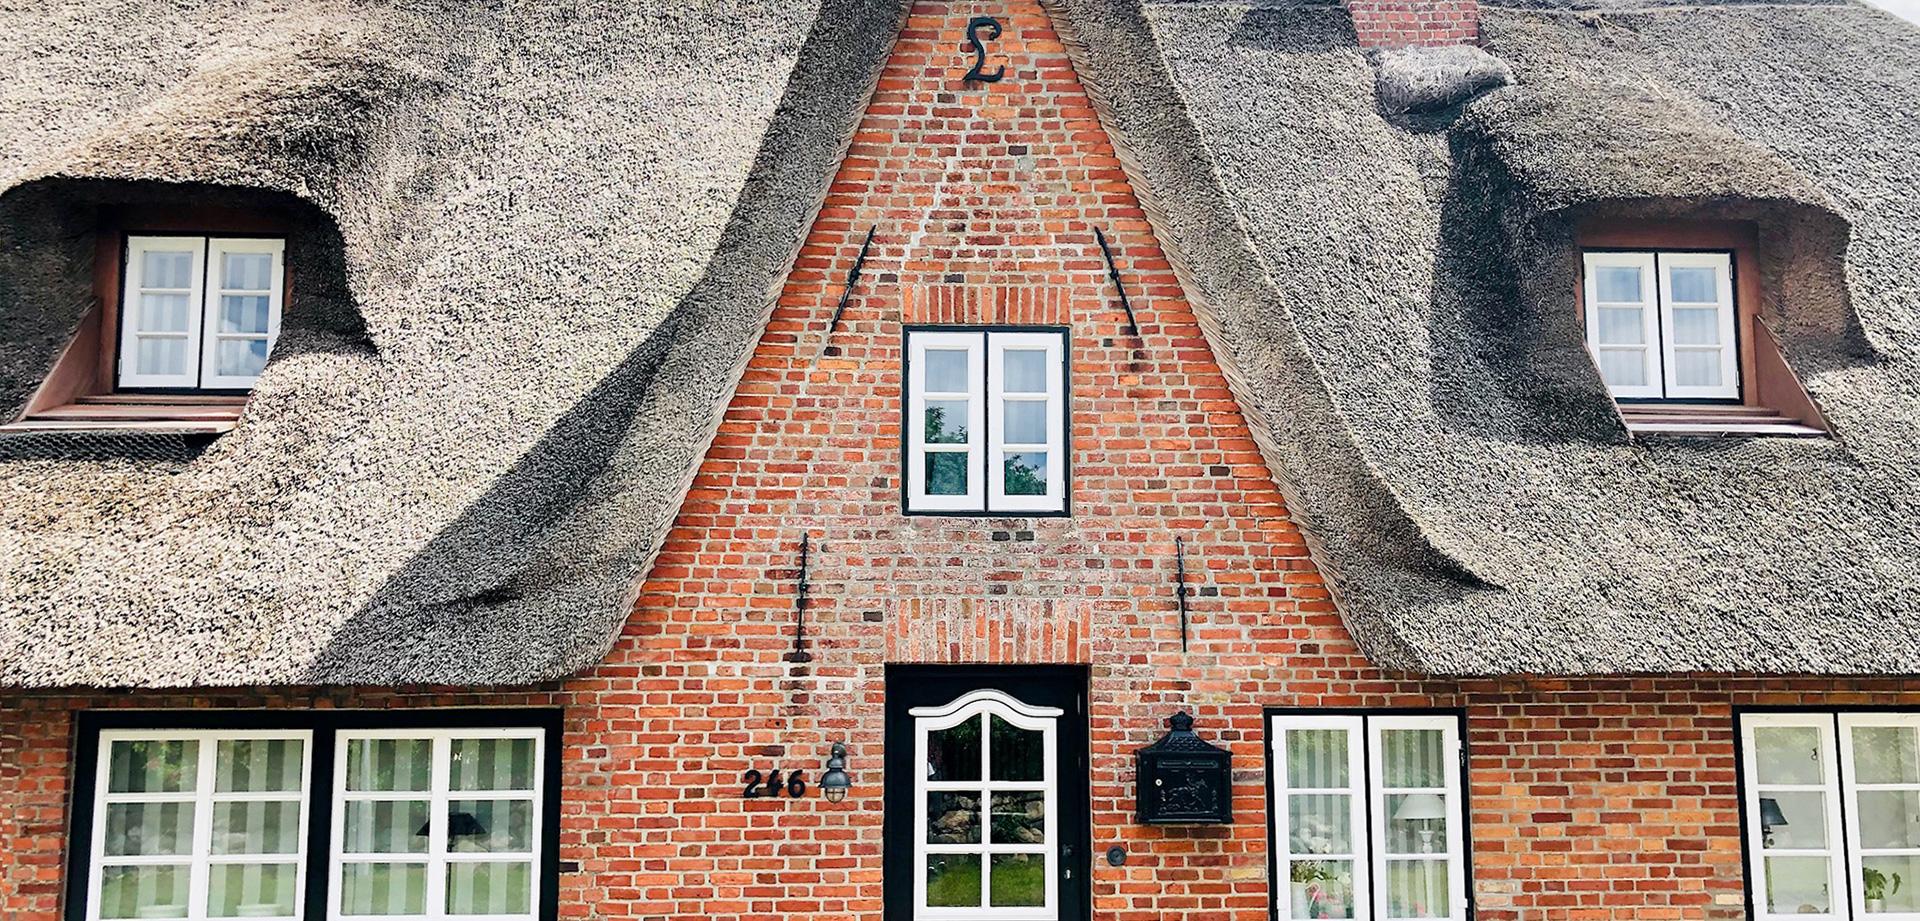 Charmantes Haus Urlaub Ferien Reethüs 1638